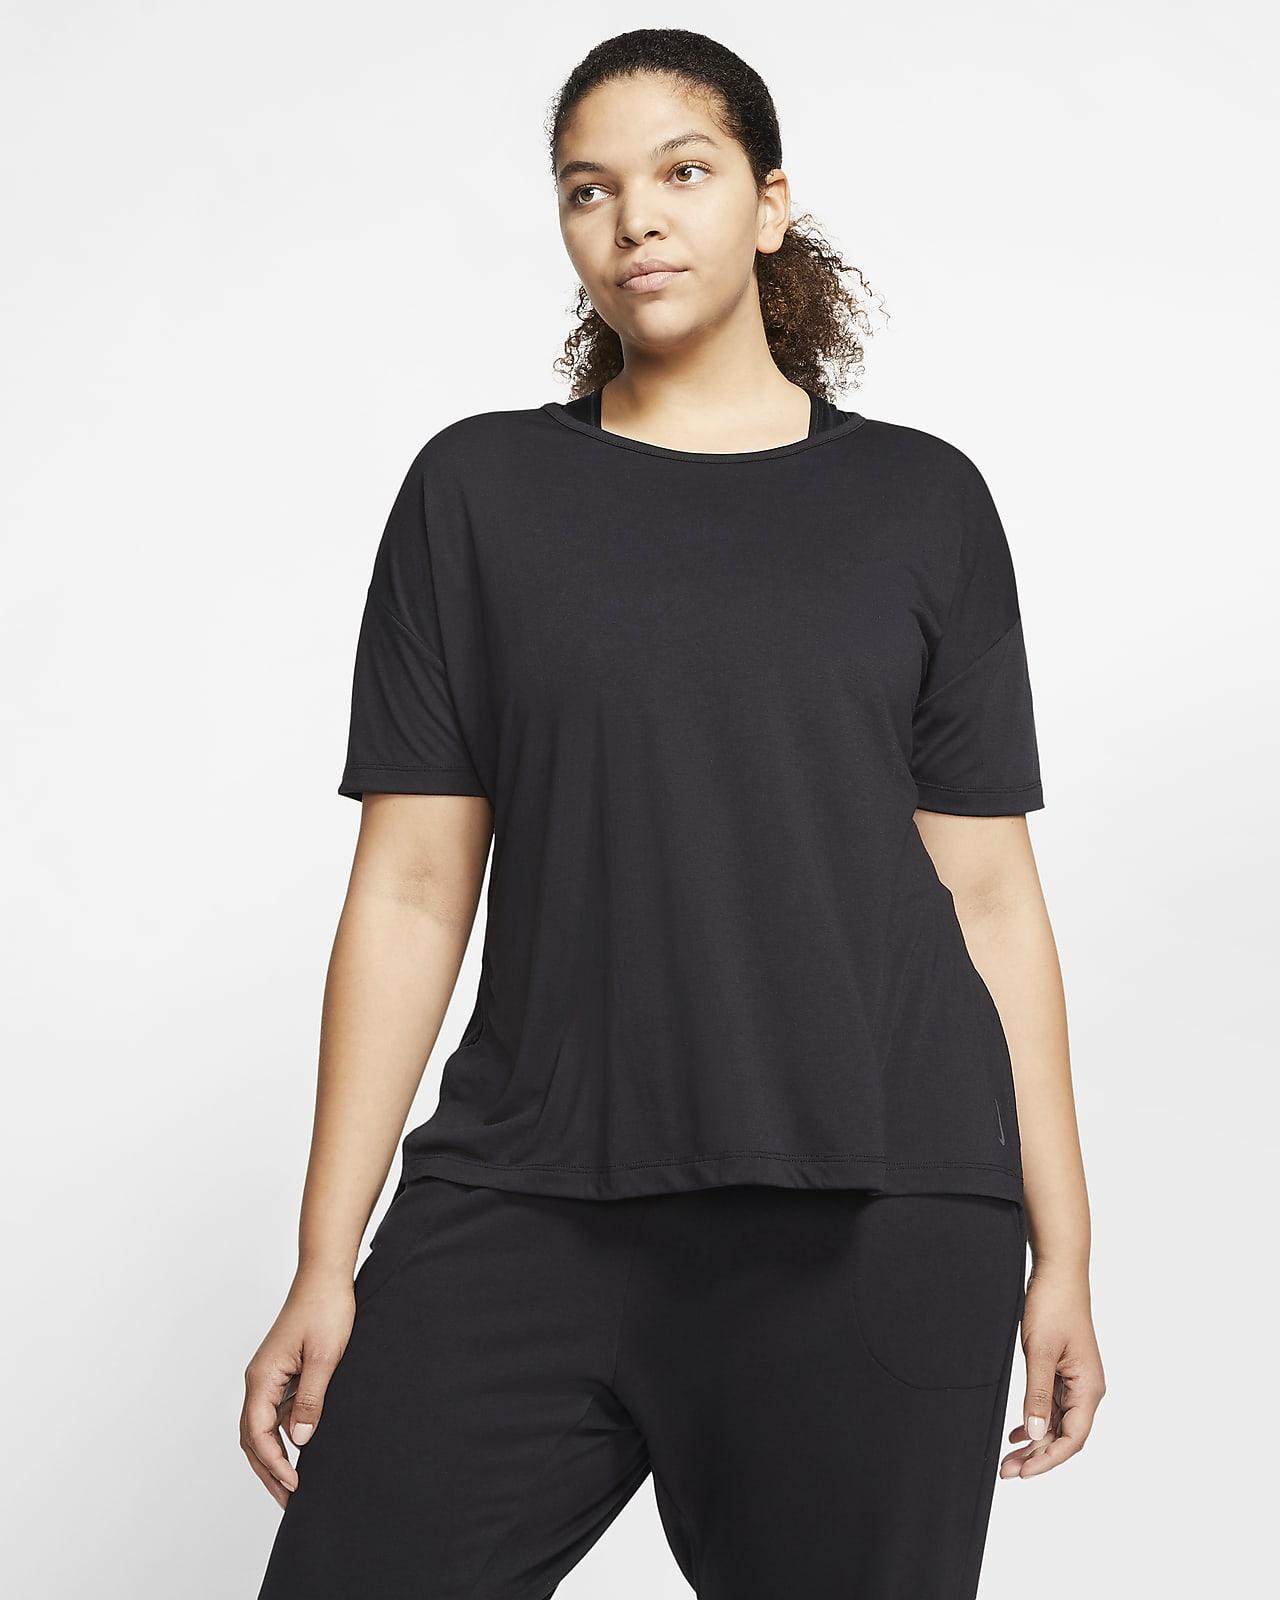 Kortärmad tröja Nike Yoga för kvinnor (stora storlekar)